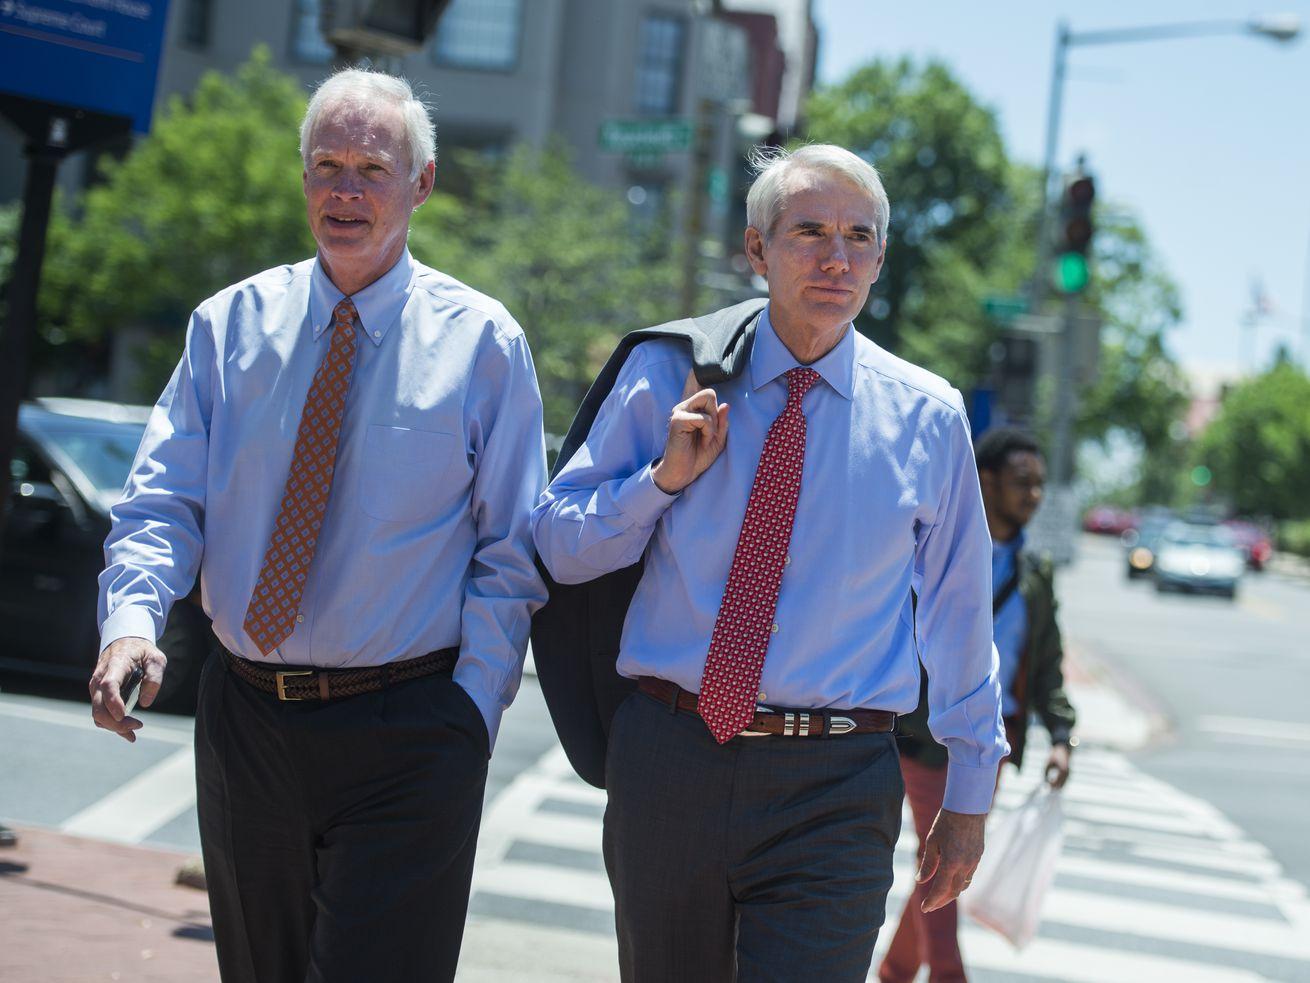 Republican Senators Rob Portman and Ron Johnson walking across an intersection in downtown Washington, DC.